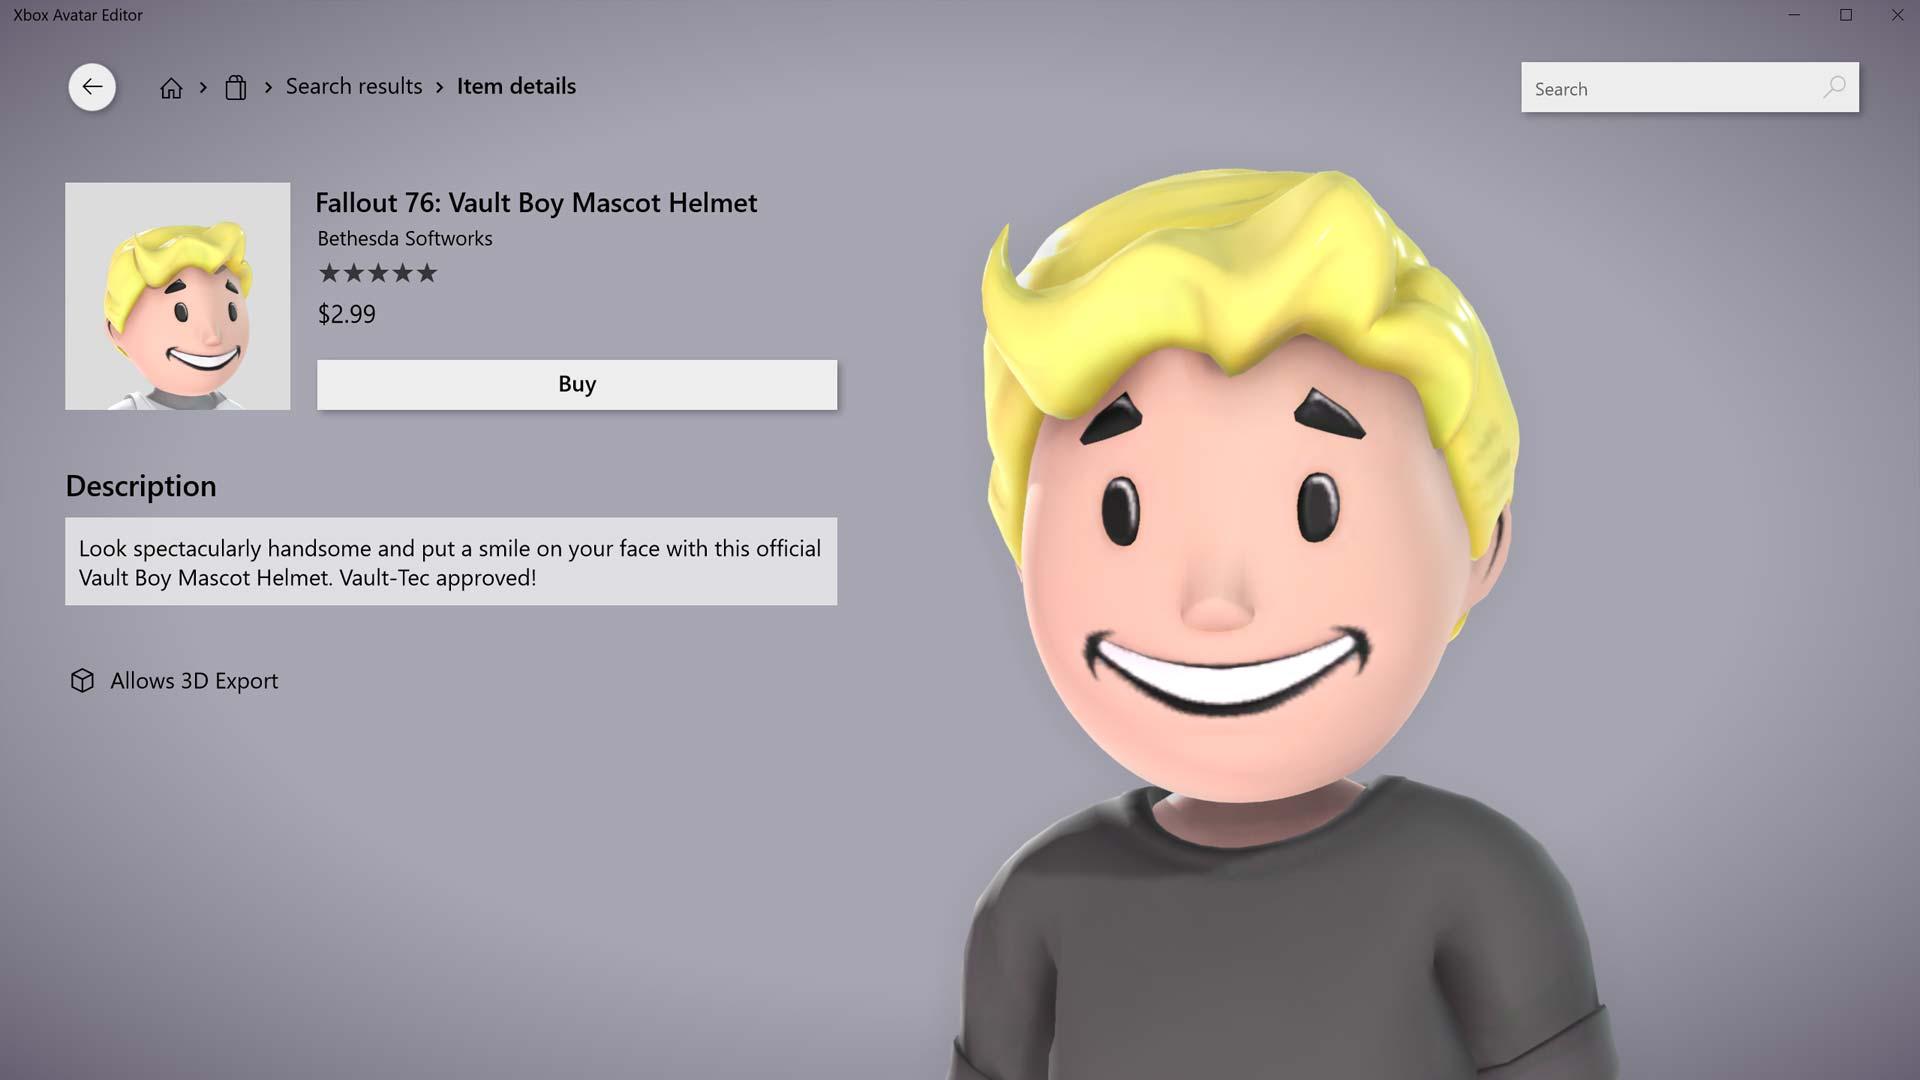 Fallout 76 Vault Boy Mascot Helmet Gamerheadquarters